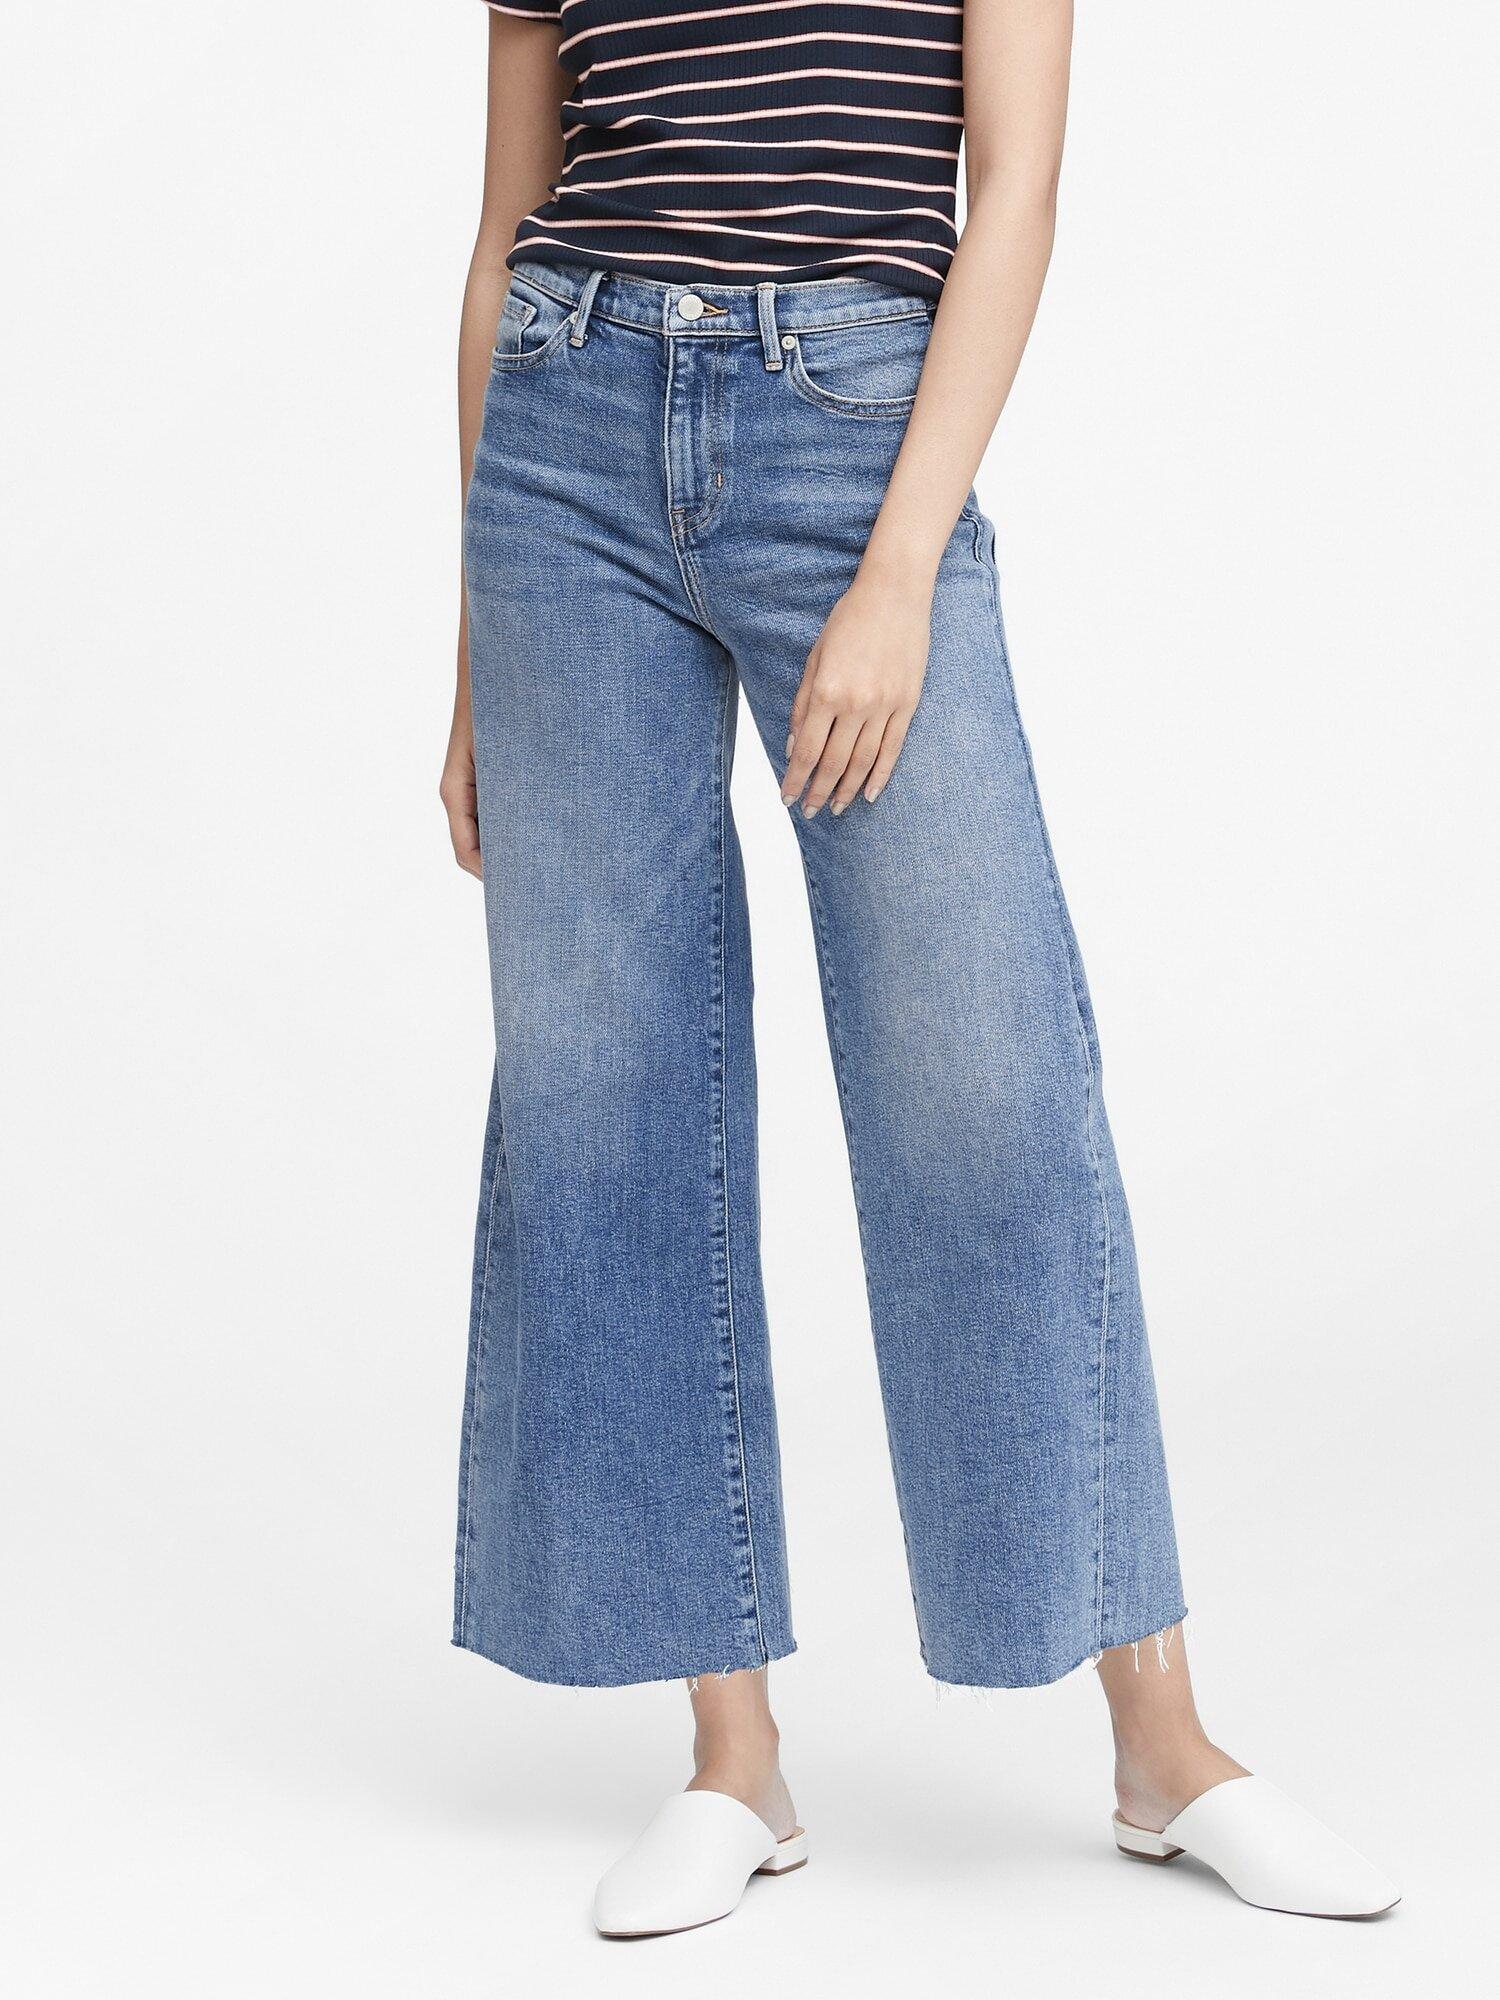 Banana Republic Jeans $68